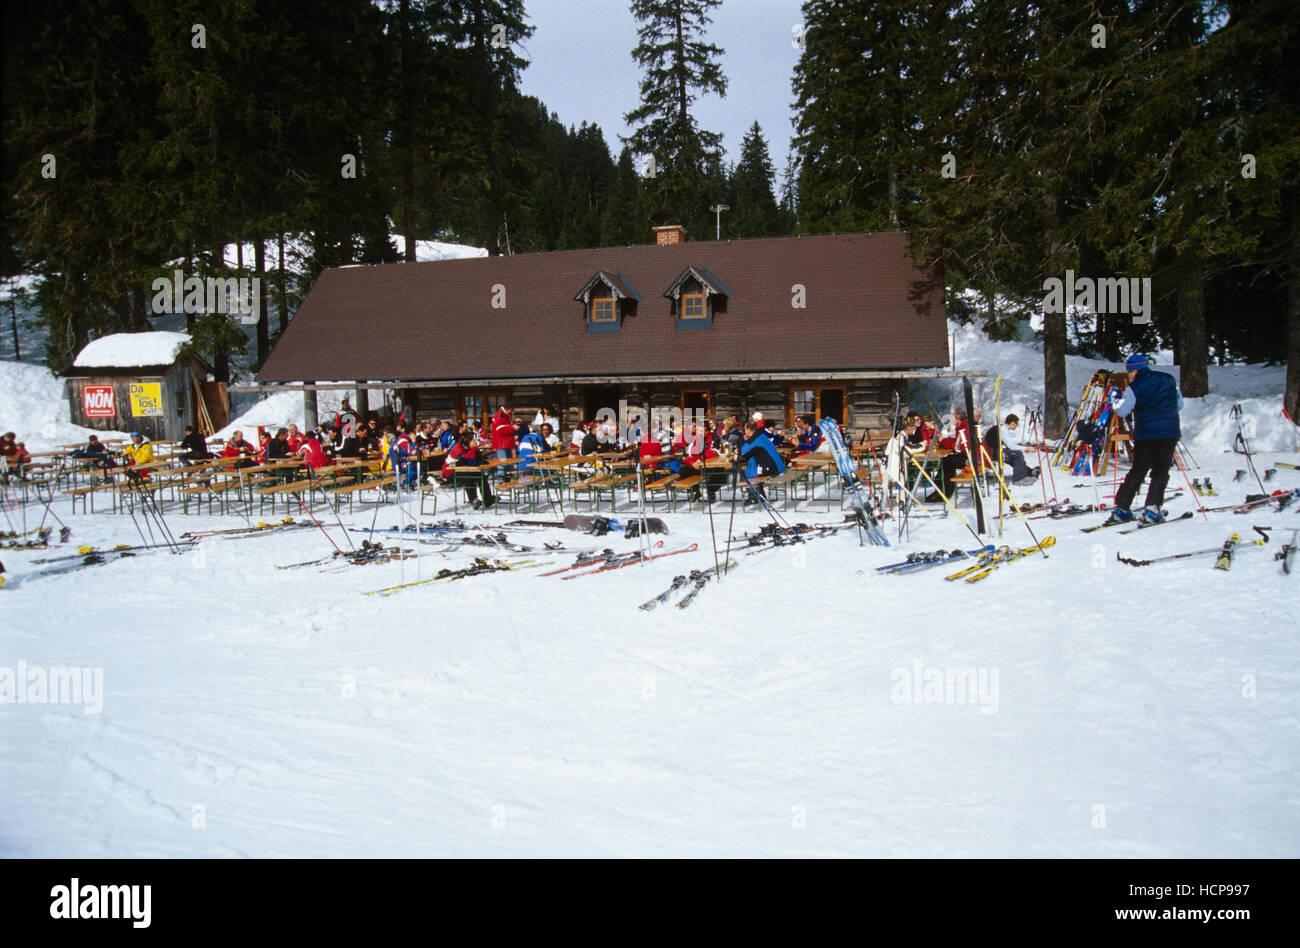 Many people at a ski hut, Hochkar, Lower Austria, Austria, Europe Stock Photo